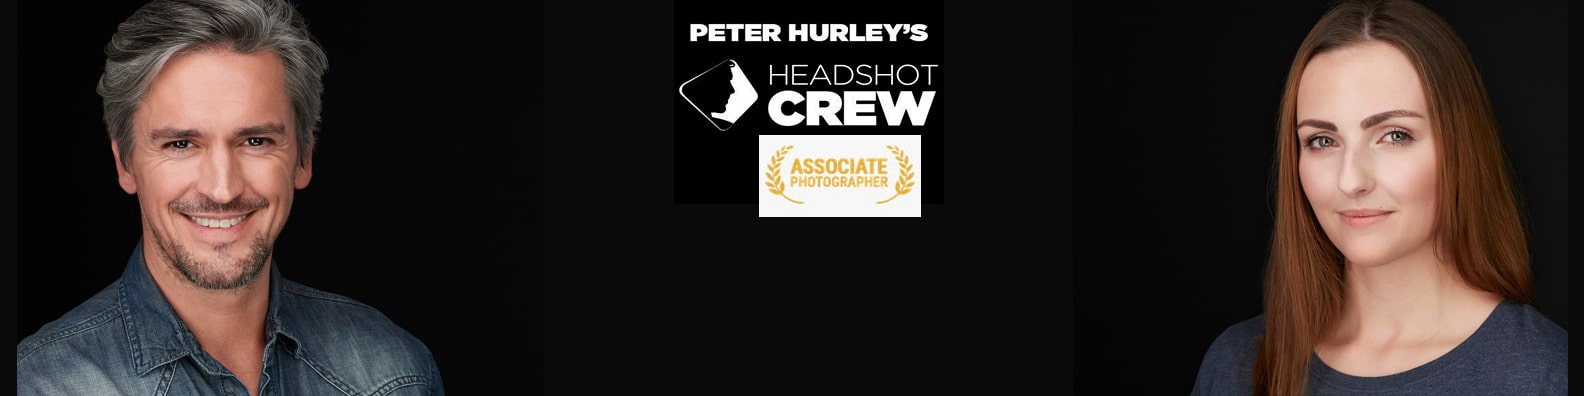 Peter Hurley Associate